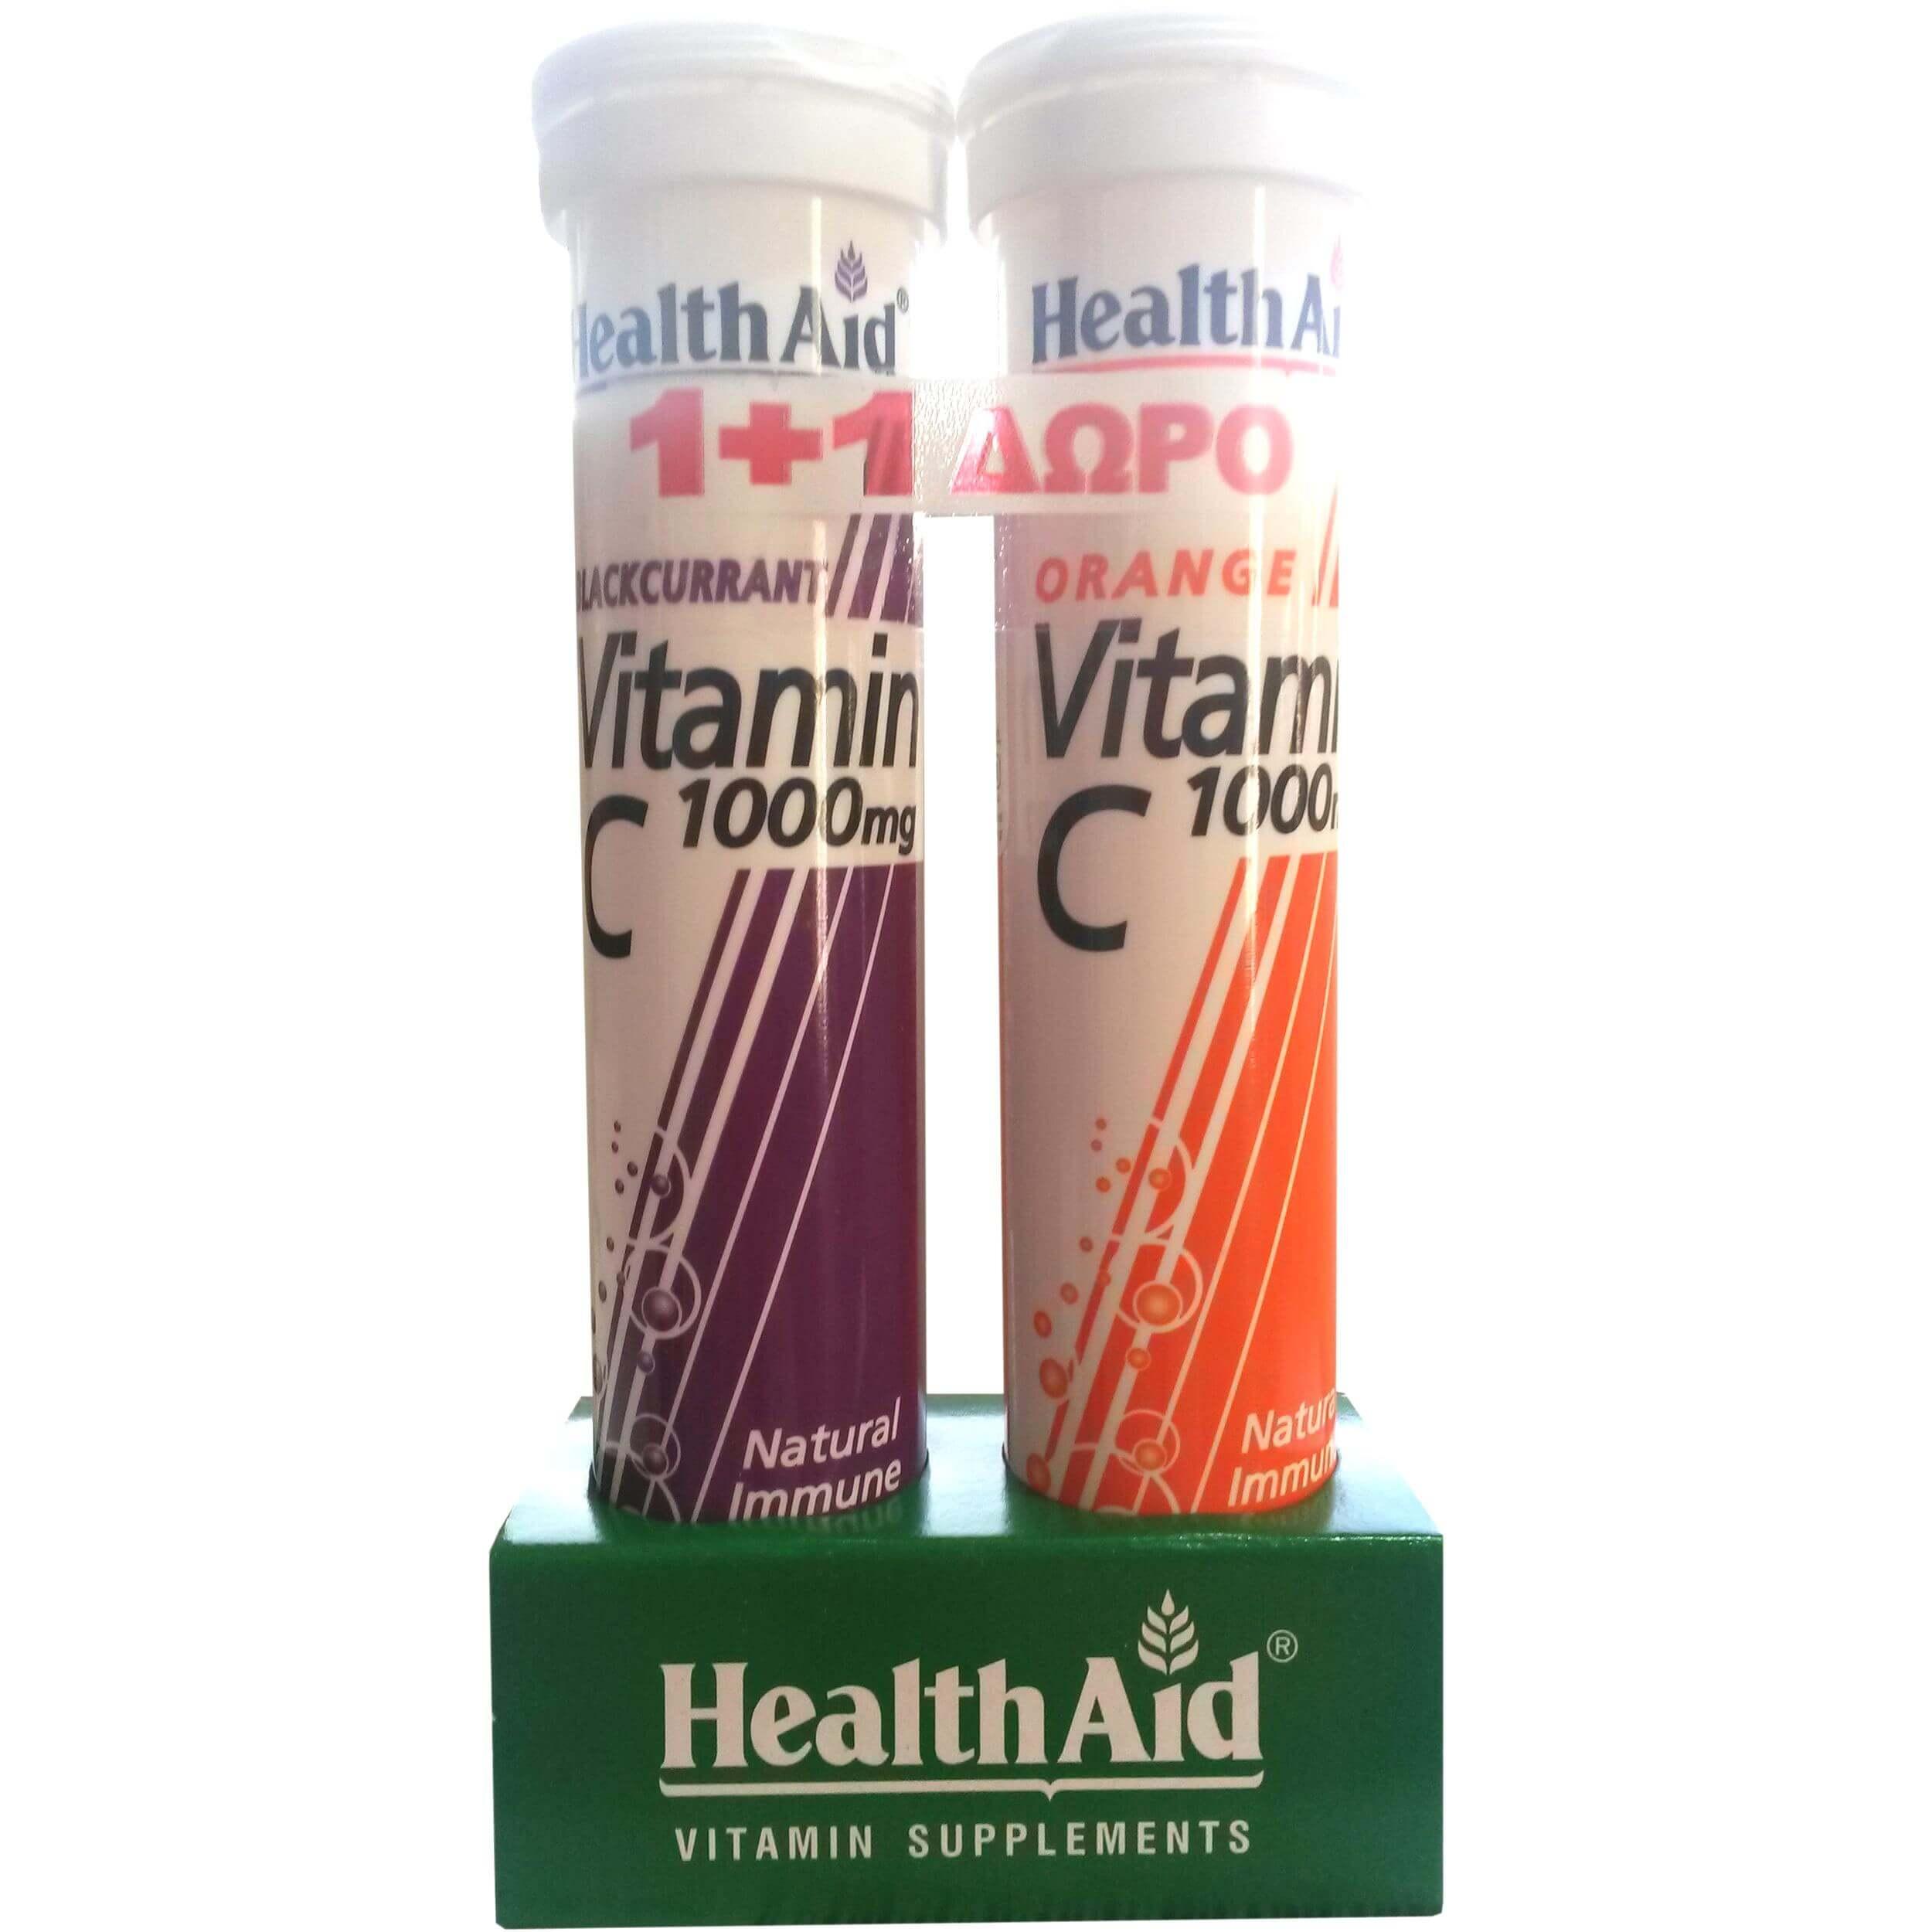 Health Aid Πακέτο Προσφοράς Vitamin C 1000mg Φραγκοστάφυλλο & Vitamin C 1000mg Πορτοκάλι 2x20effer.tabs 1+1 Δώρο